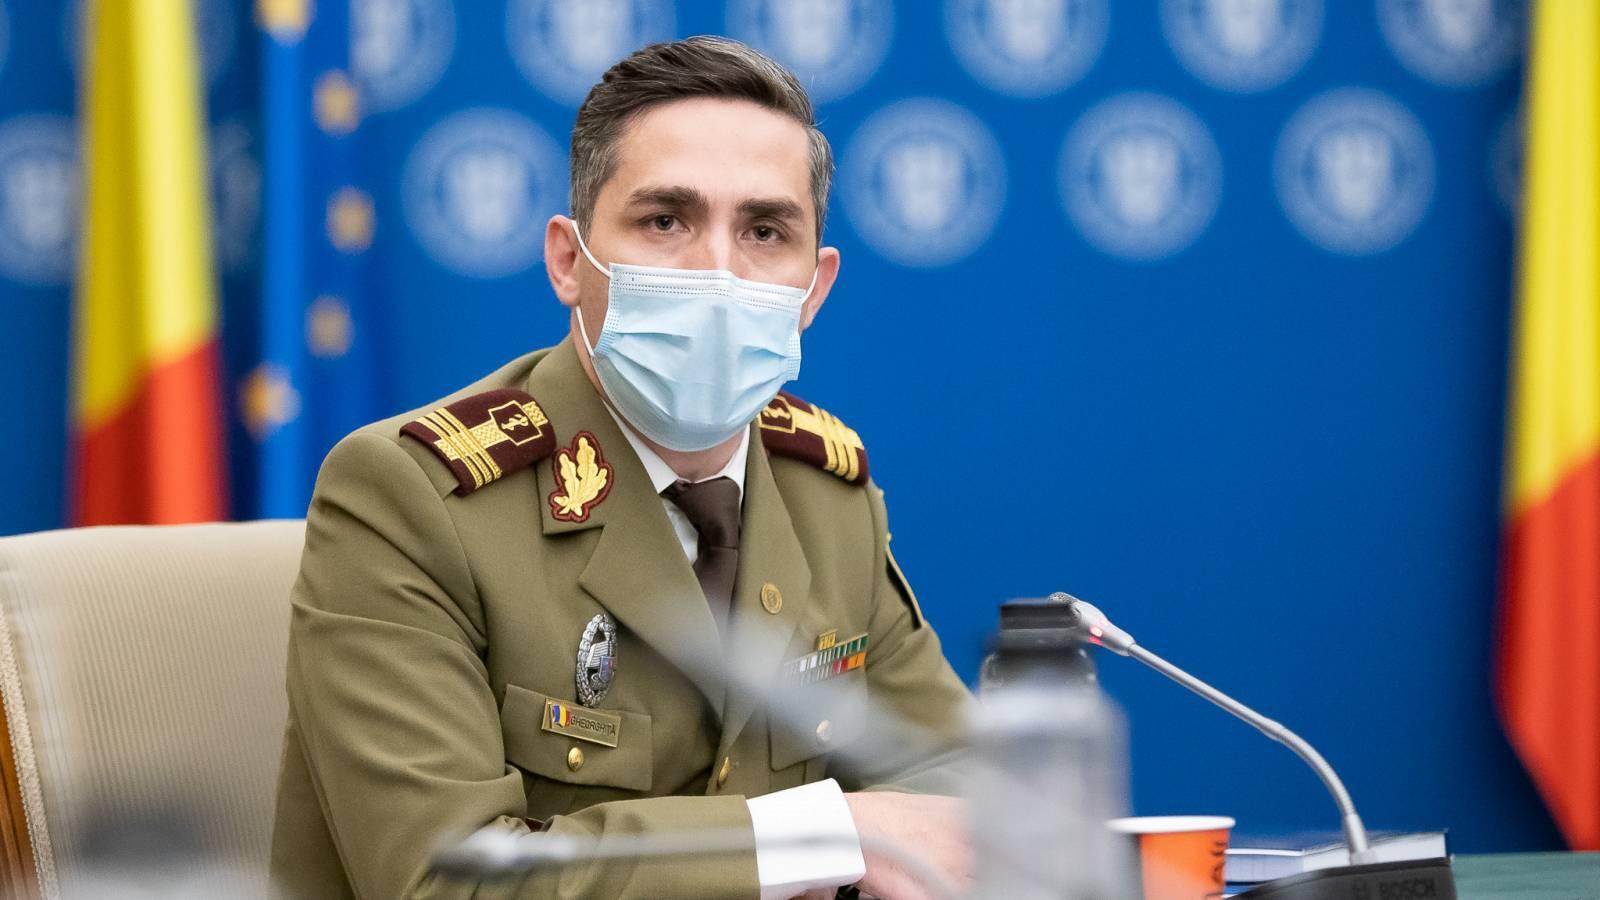 Anunt Valeriu Gheorghita pandemie romania